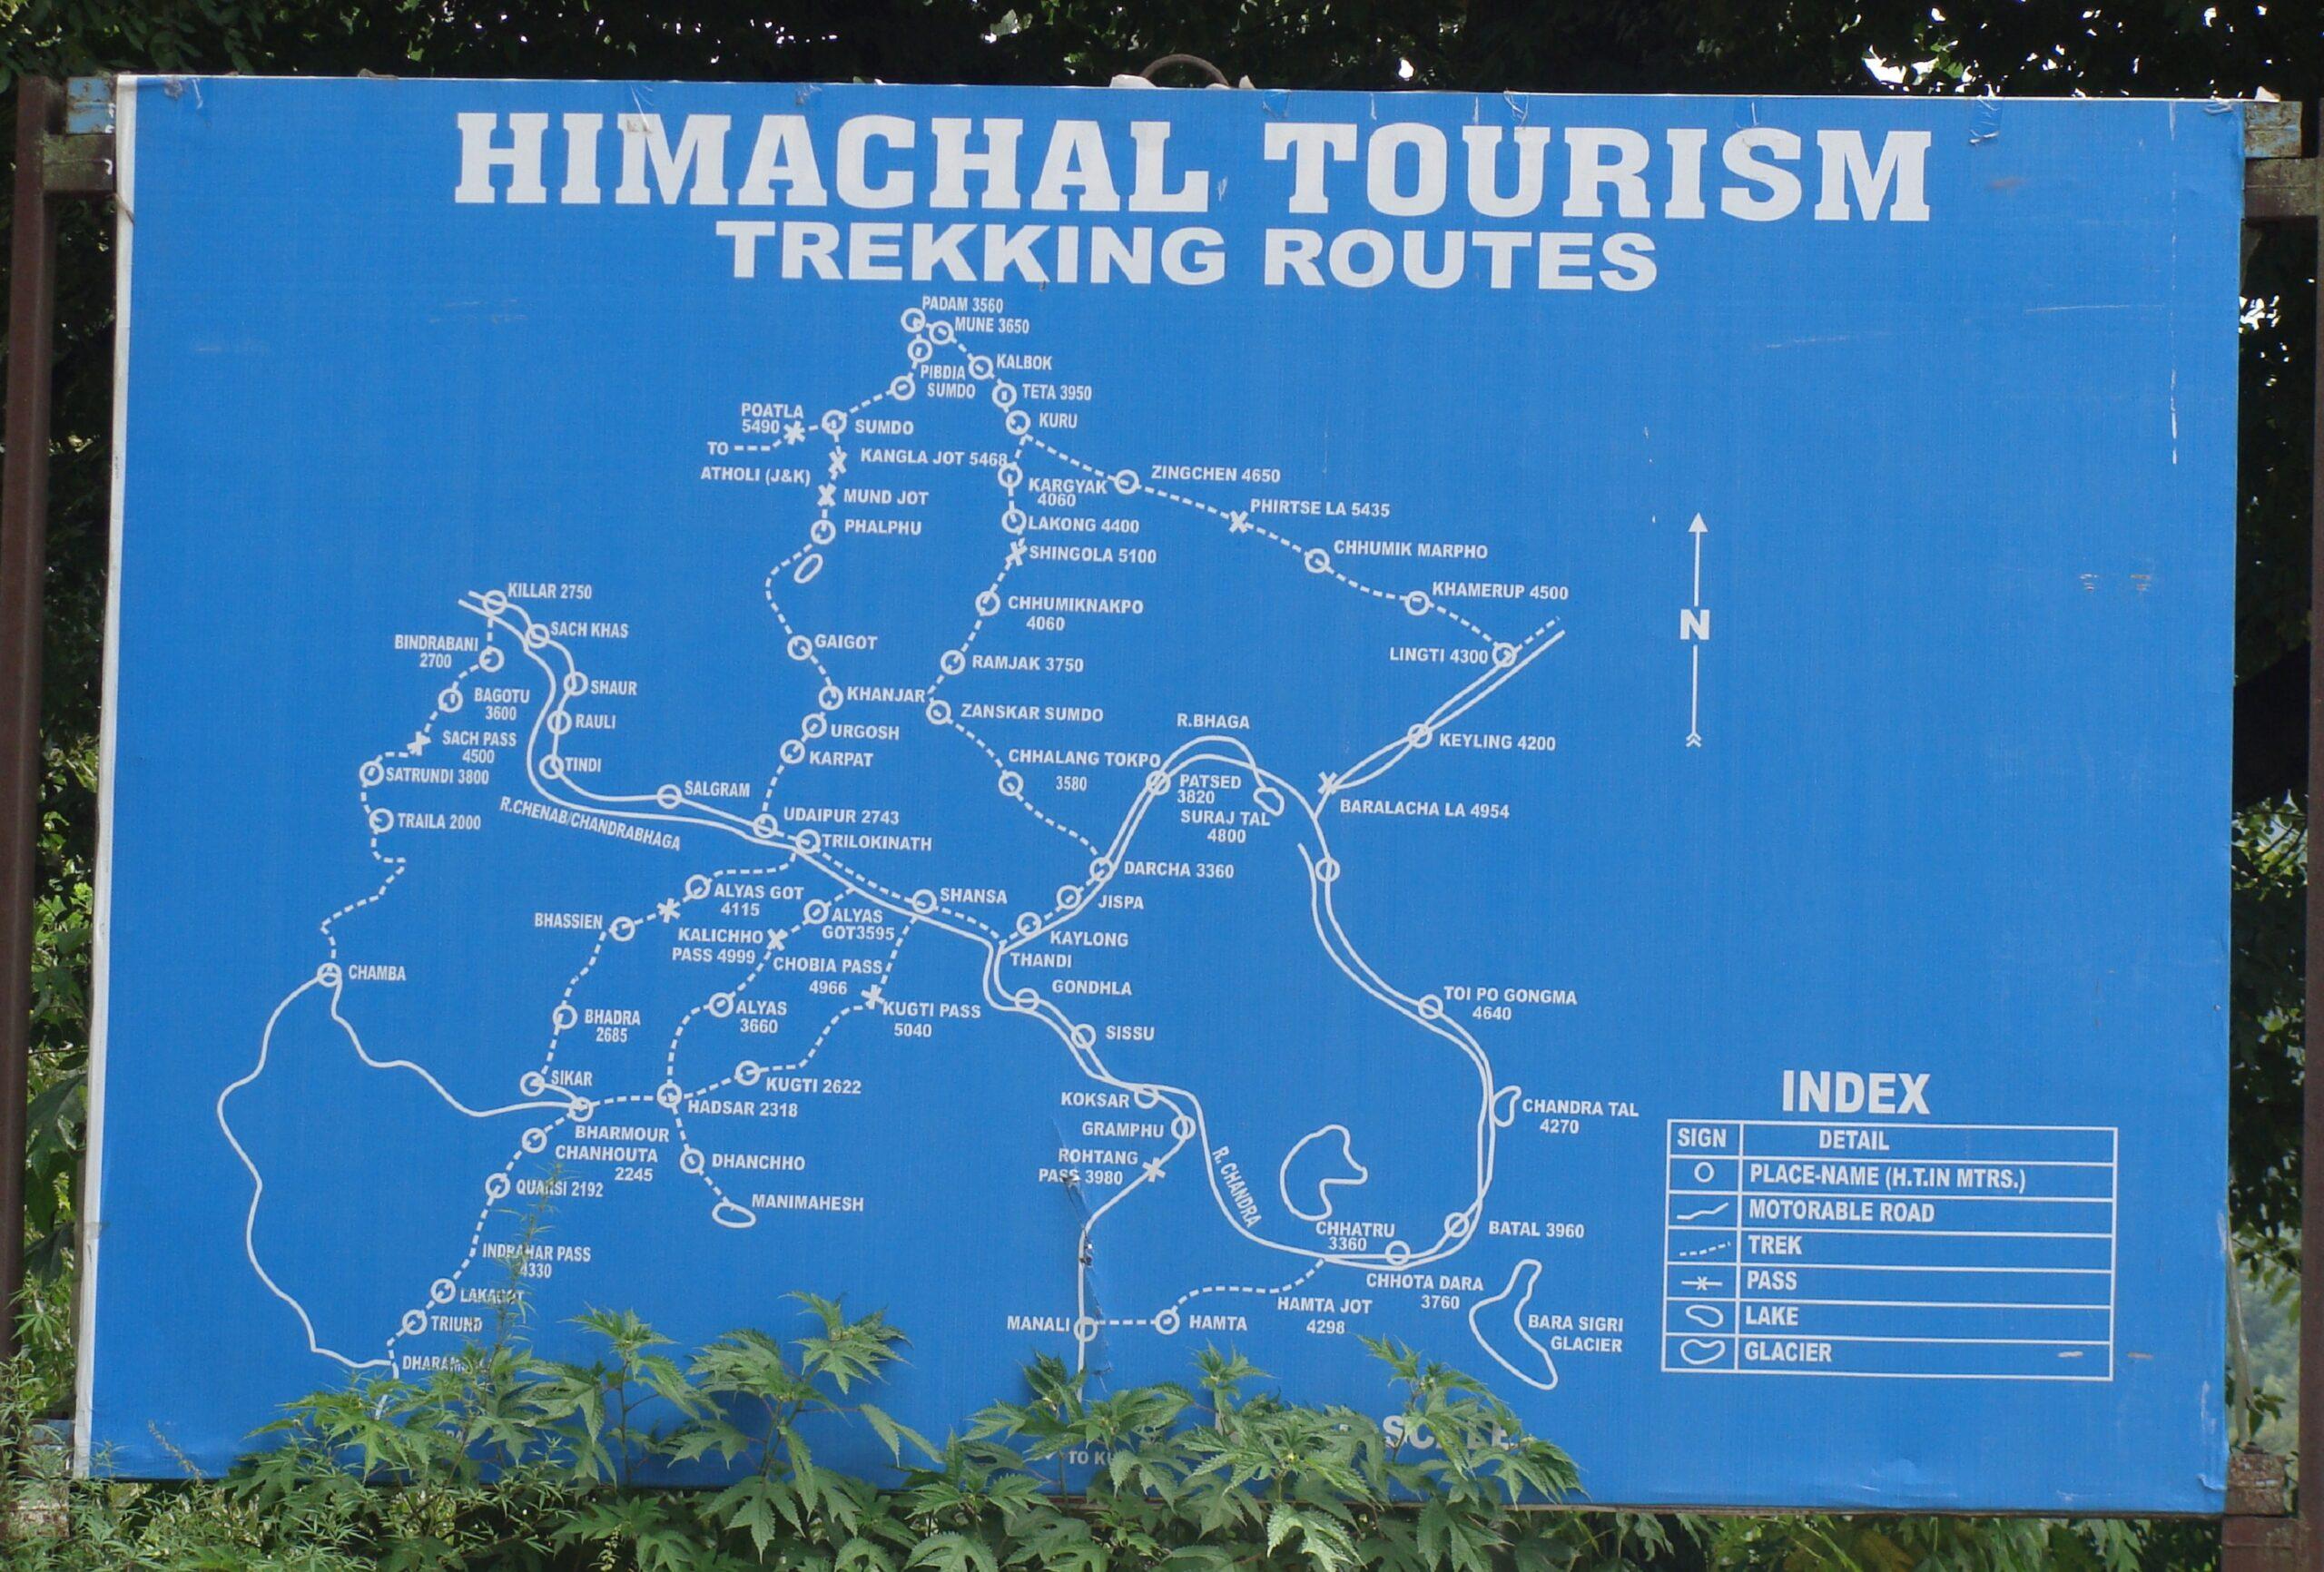 Trekking Routes in Himachal Pradesh, India